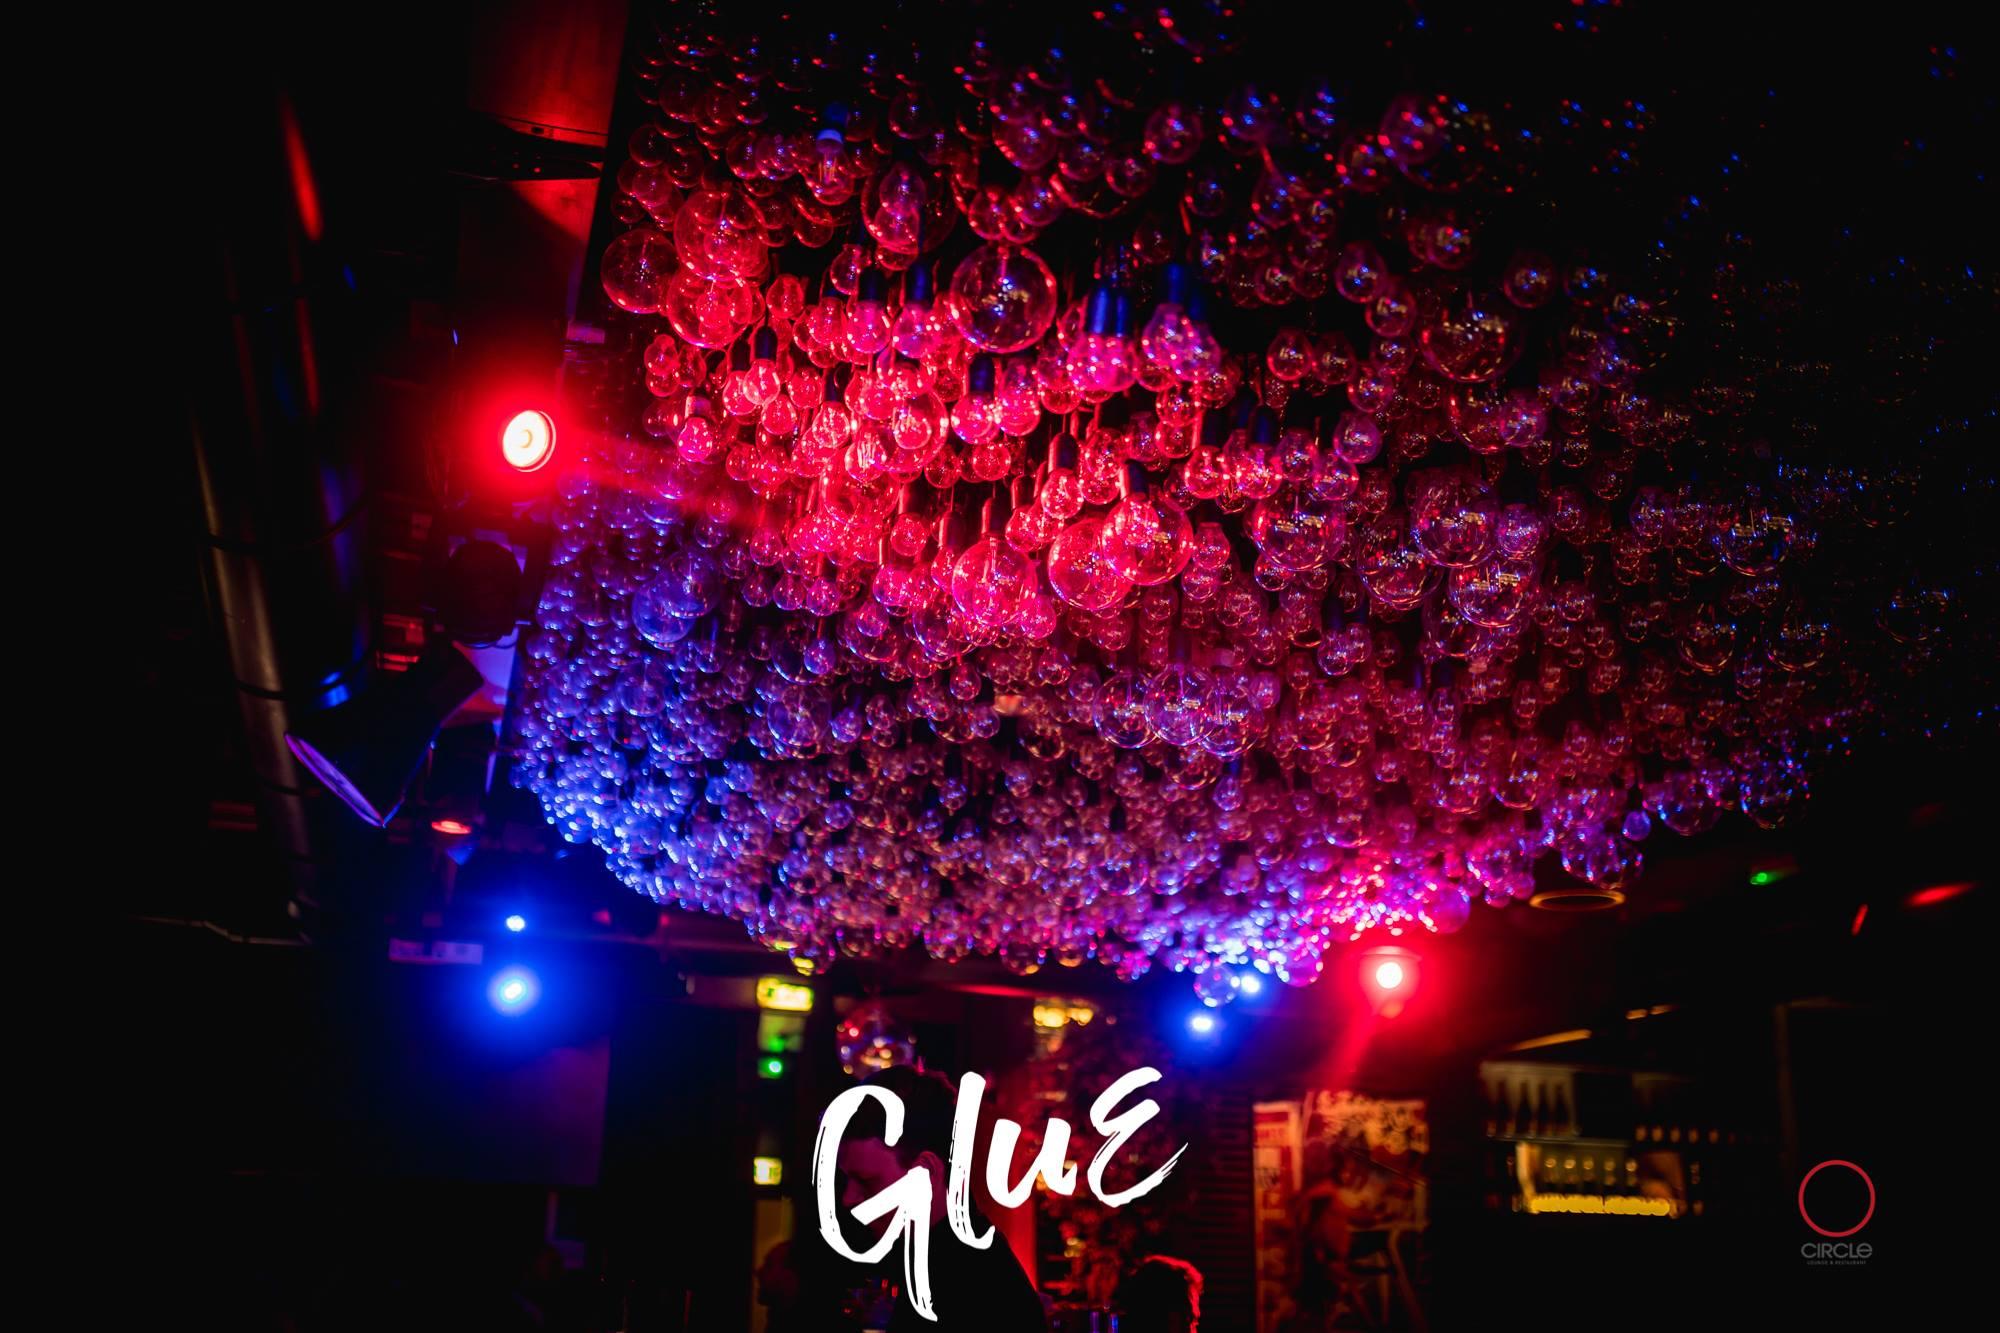 GLUE / Revolution | YOUparti house music friday venerdì circle free gratis